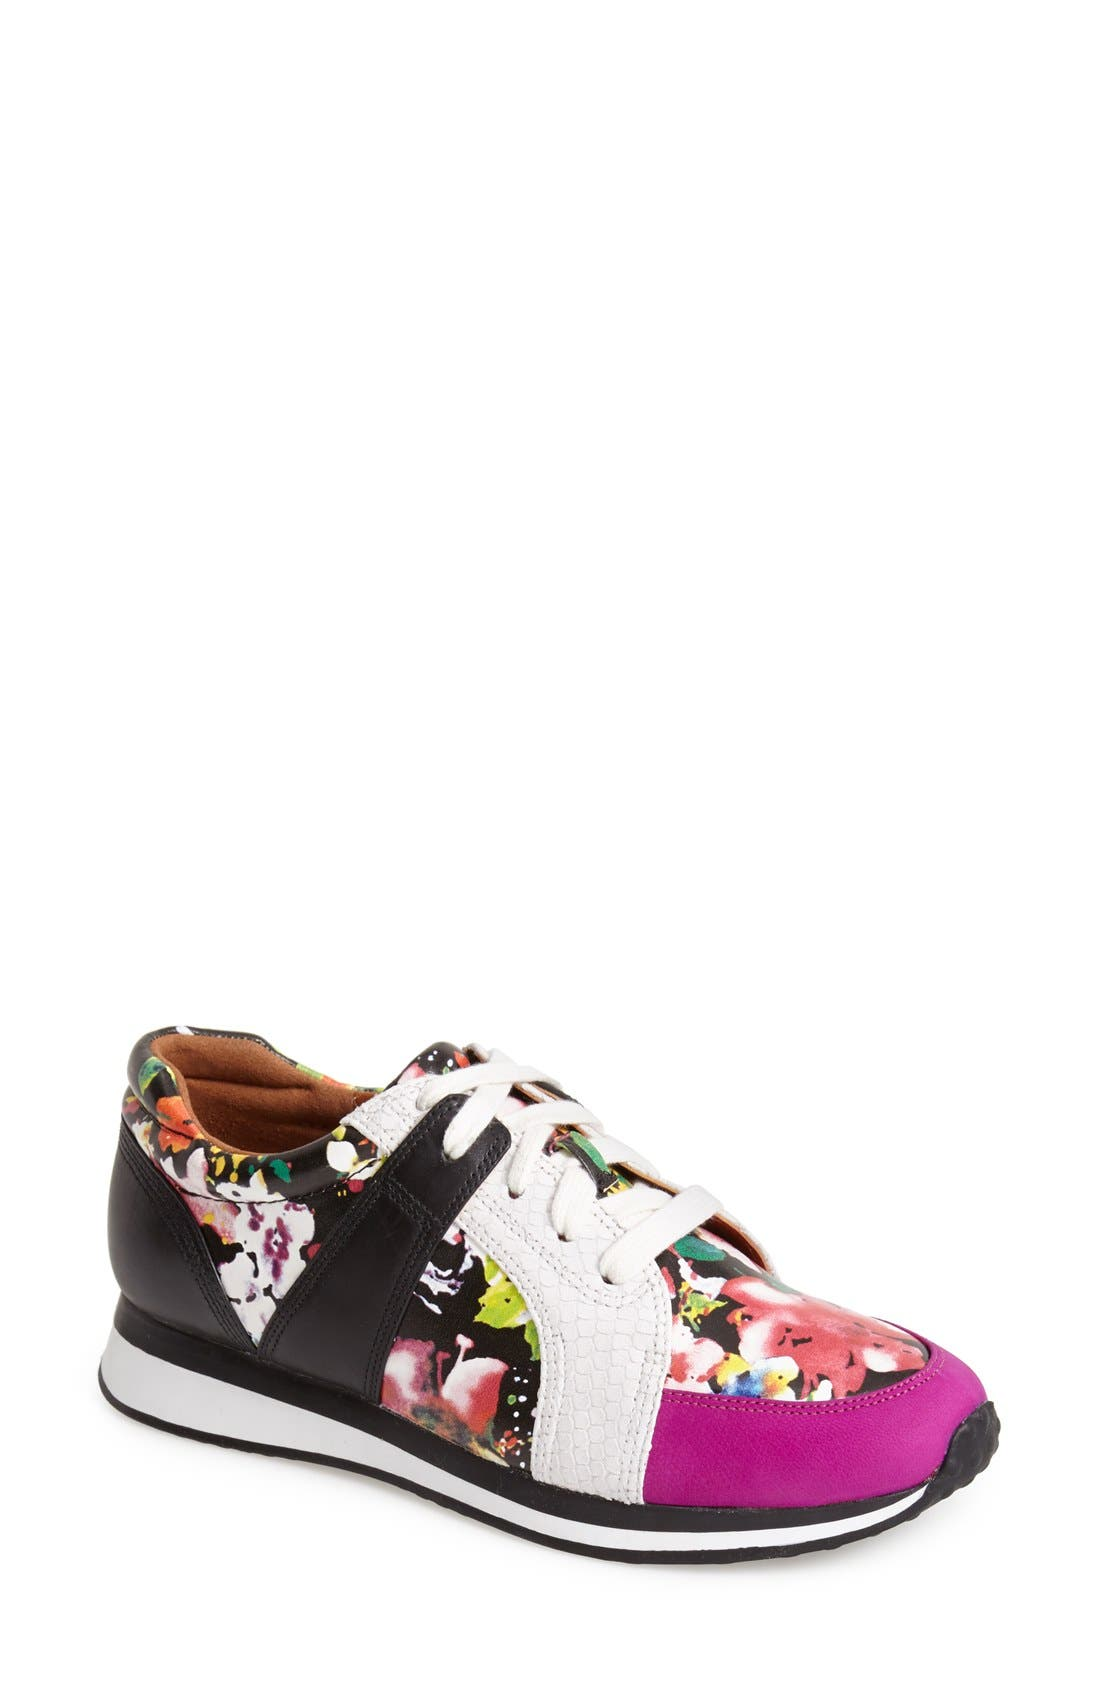 Main Image - Enzo Angiolini 'Reeber' Sneaker (Women)